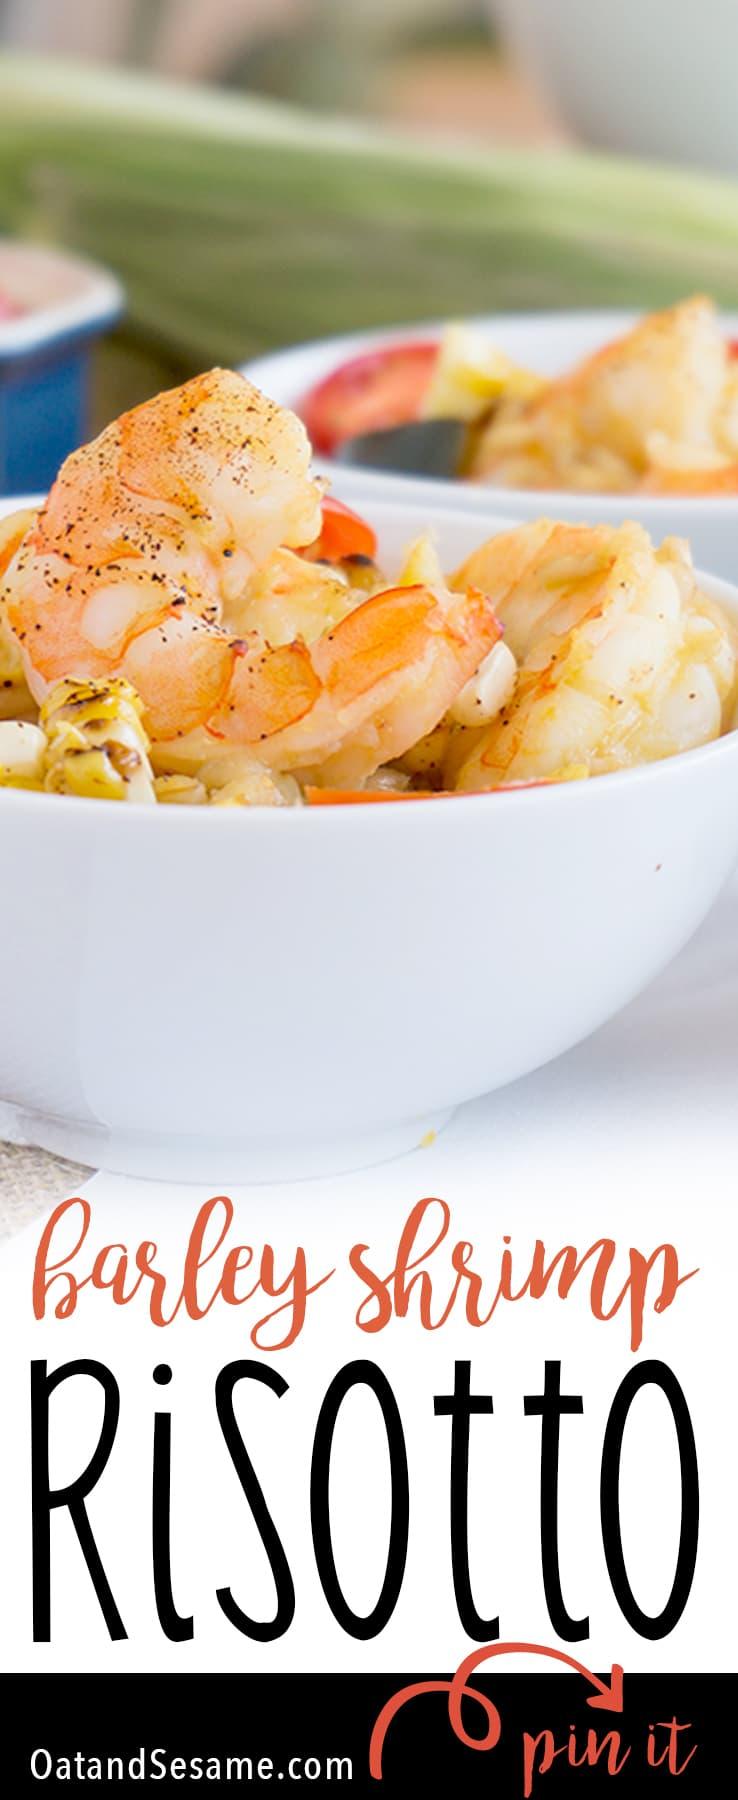 Shrimp, Zucchini and Sweet Corn Barley Risotto - a summer risotto with fresh corn, zucchini and cherry tomatoes.   recipe at OatandSesame.com